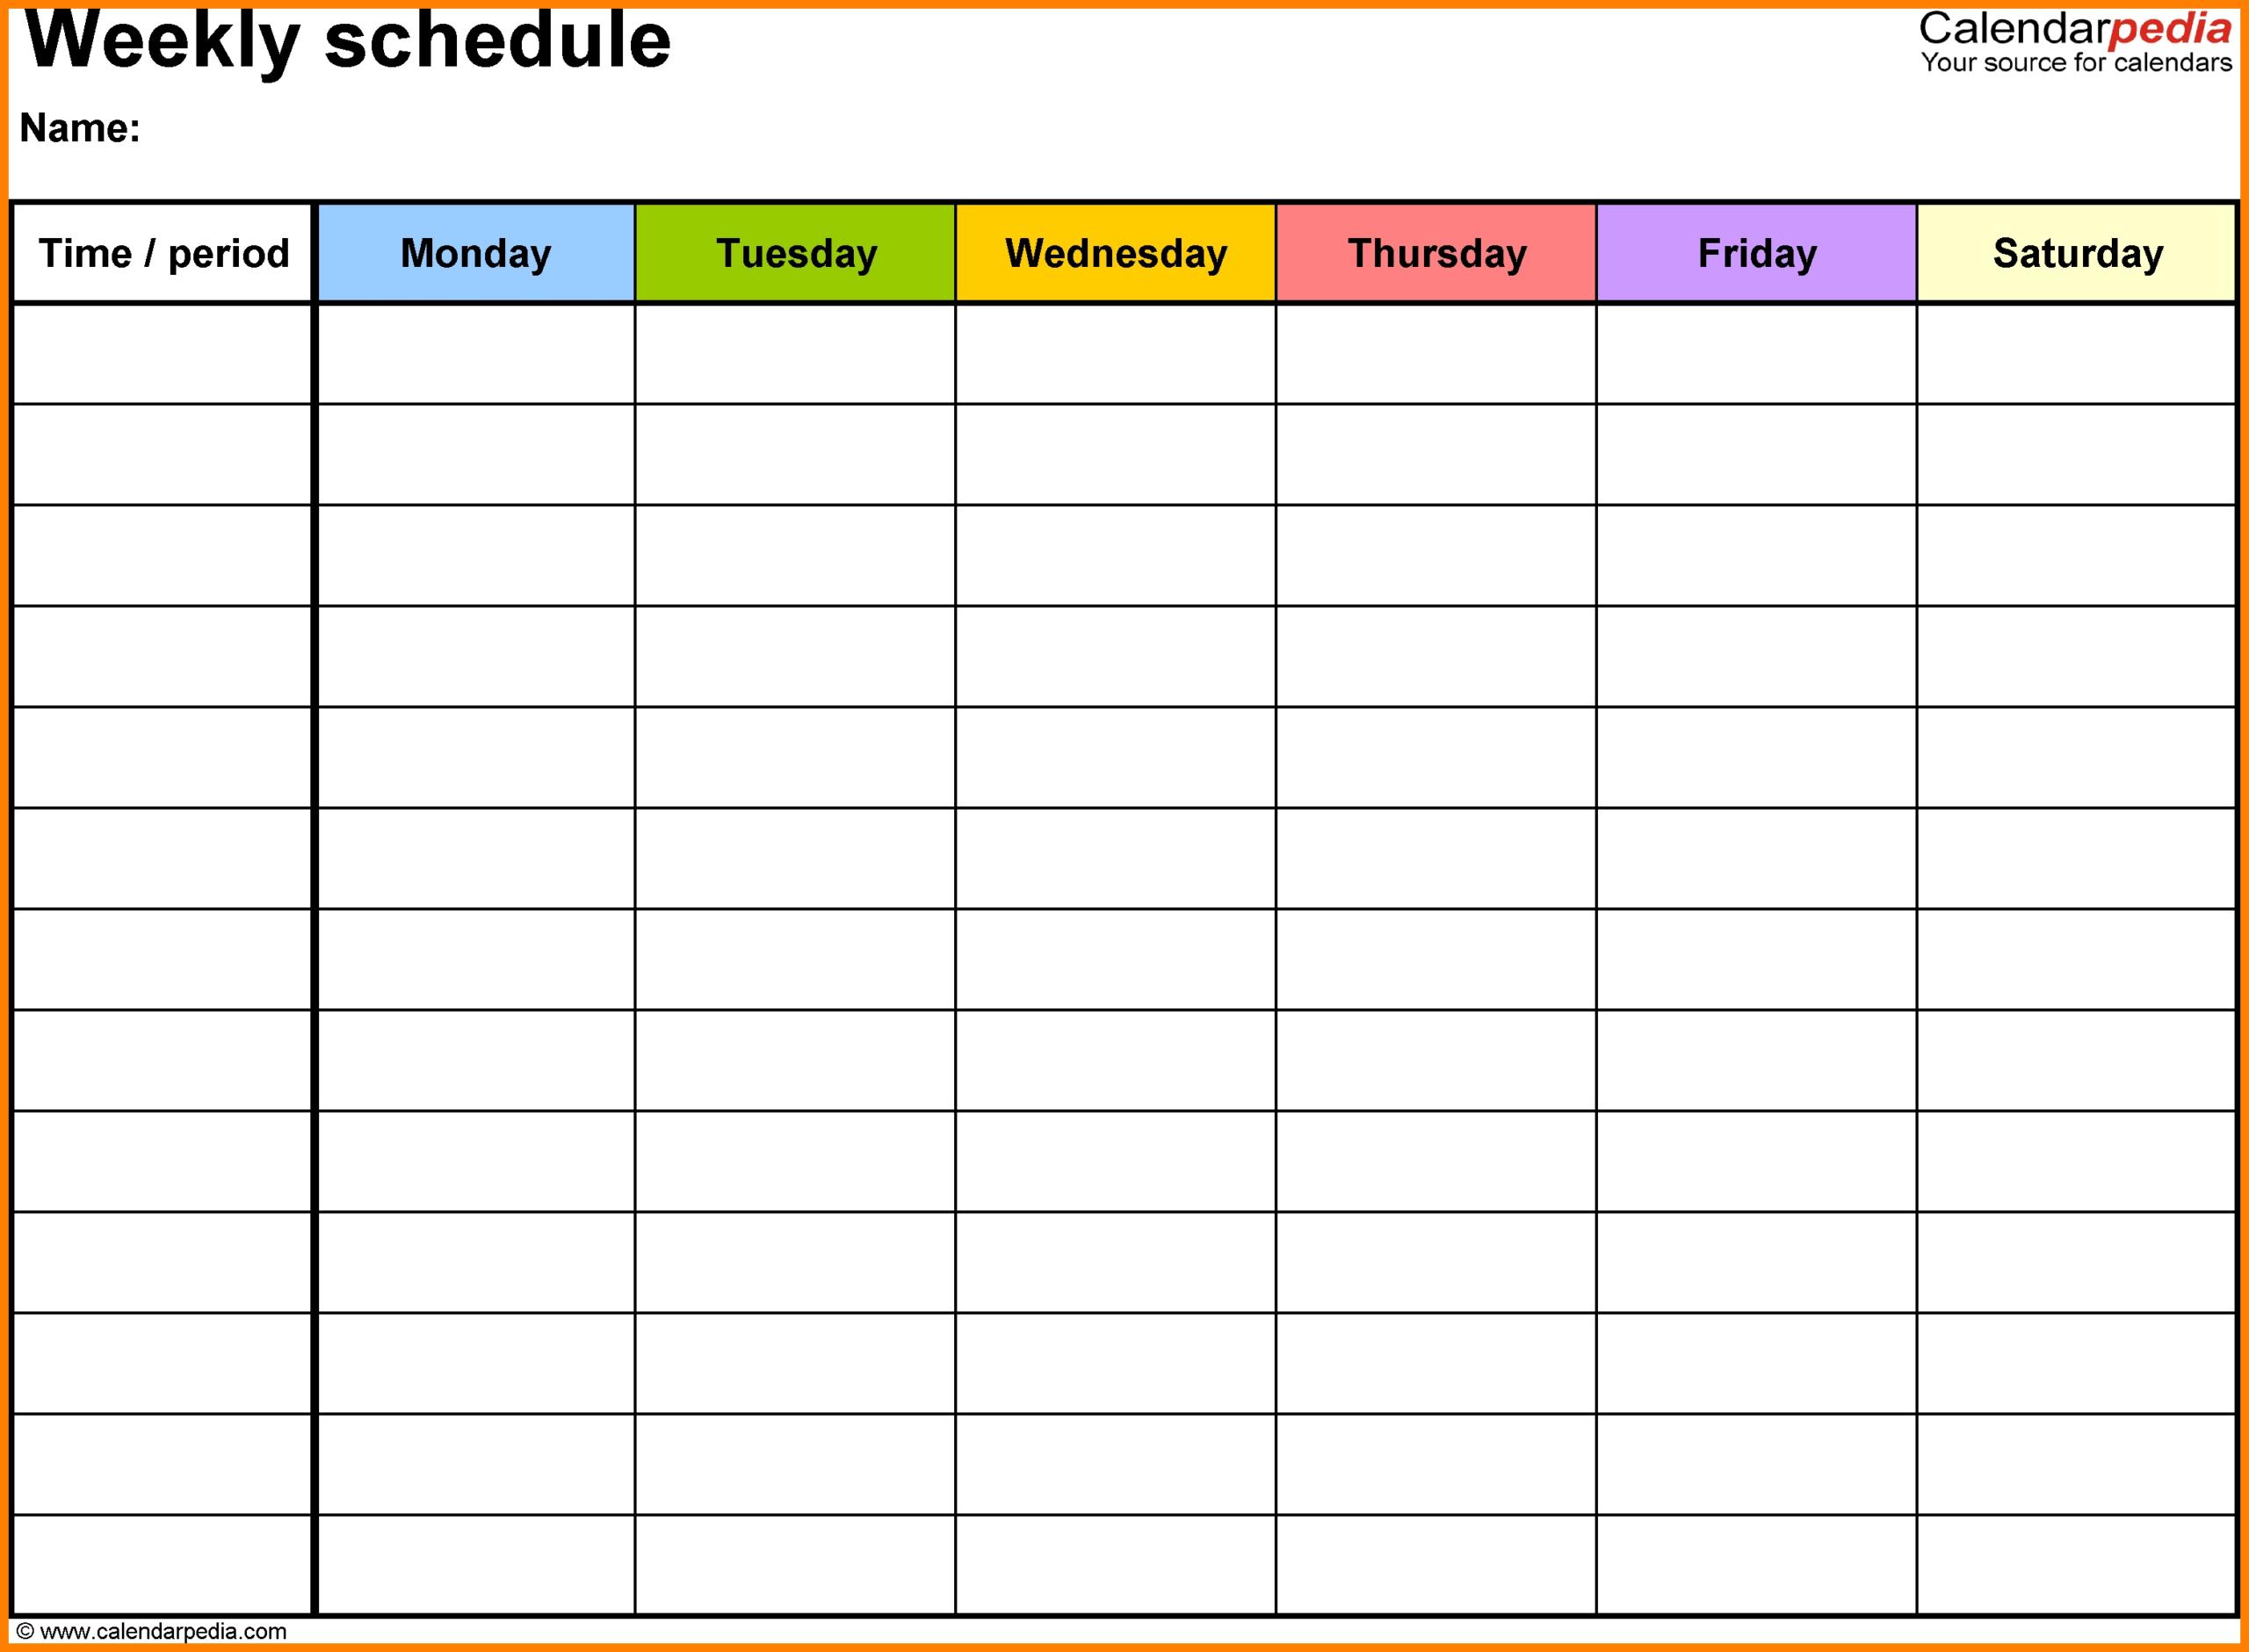 Printable Weekly Calendar With Time Slots  Calendar for Printable Weekly Planner With Time Slots